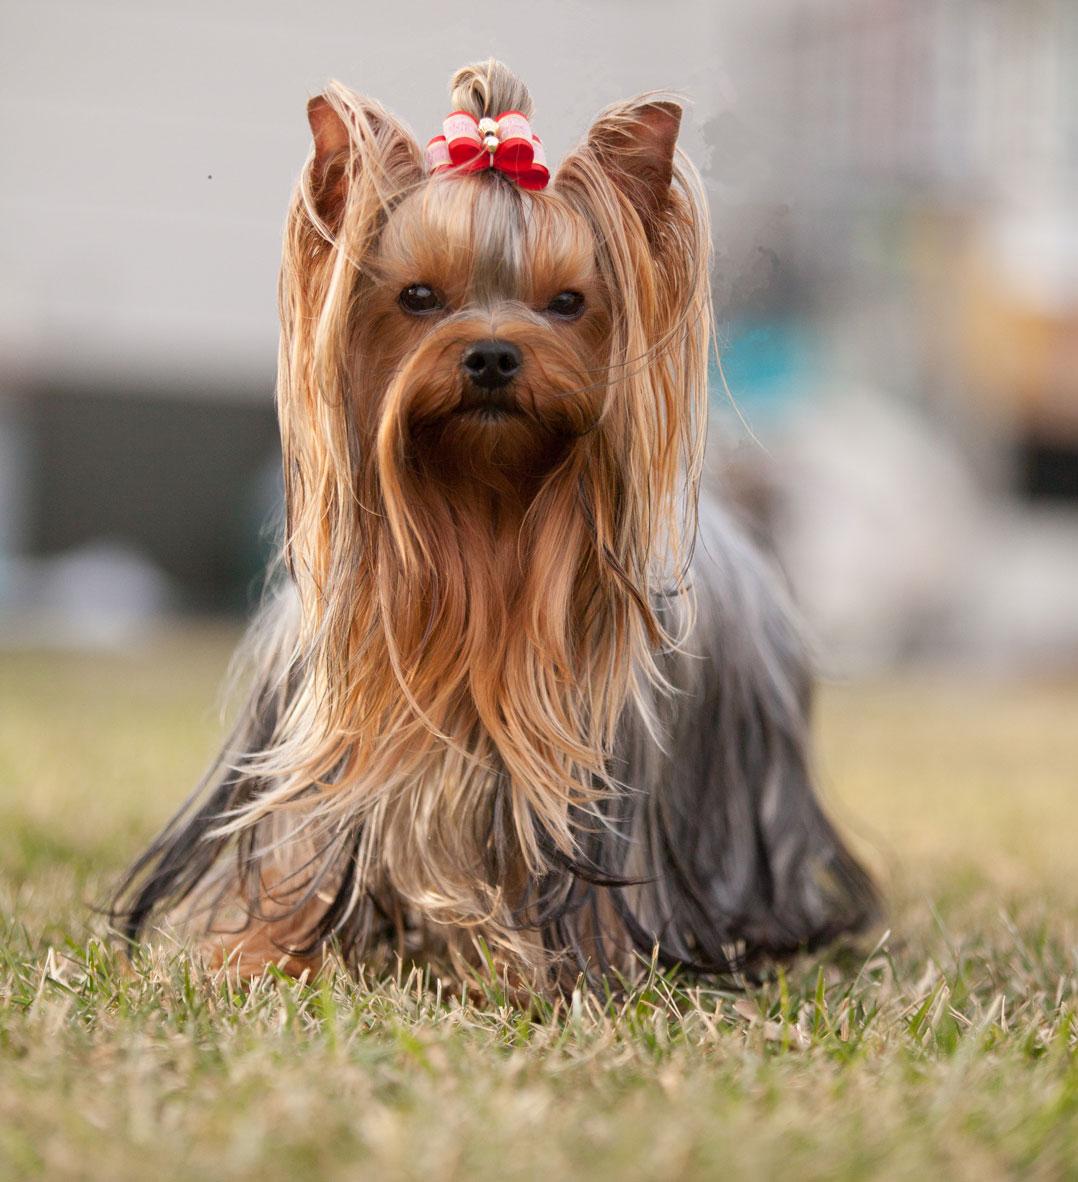 Gracie - GorjessPets Yorkshire Terrier - Gorjesspets.com